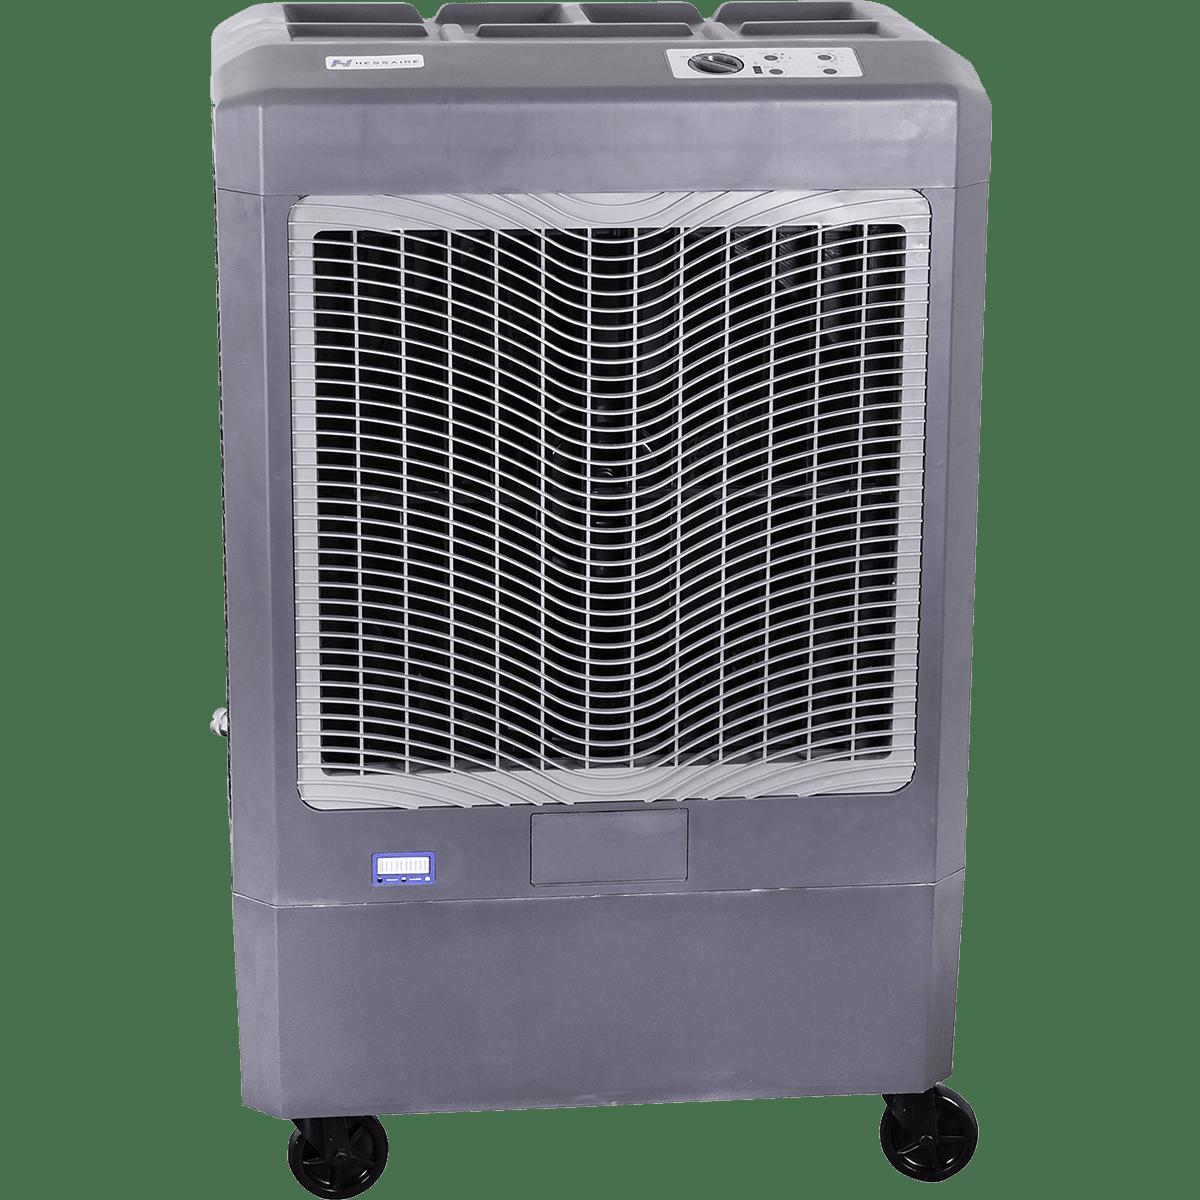 Swamp Cooler Media : Hessaire mc a cfm evaporative cooler w automatic